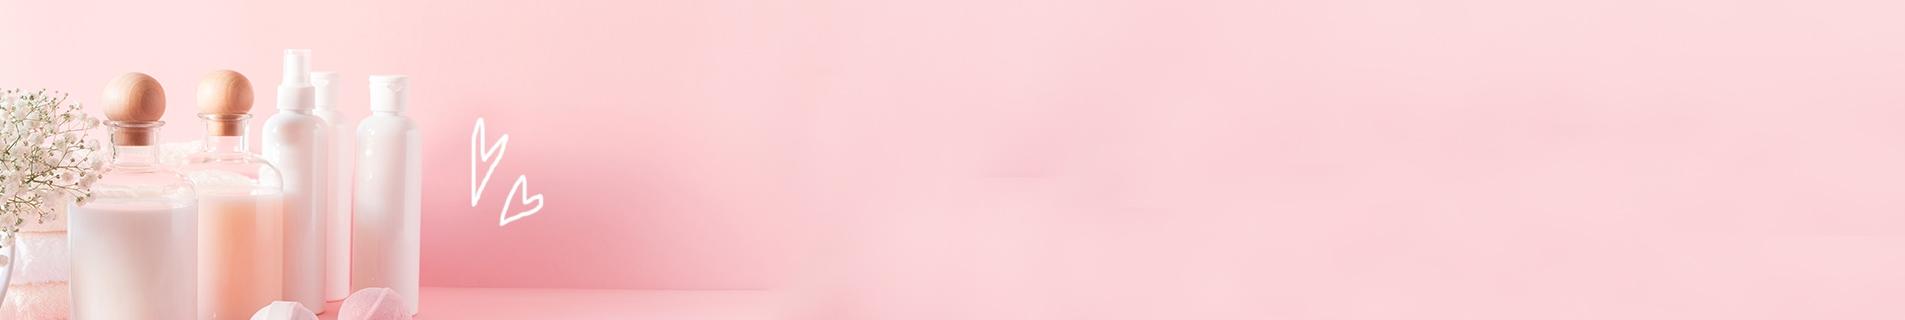 Promo moins de 5€ | Site de maquillage pas cher | SAGA Cosmetics